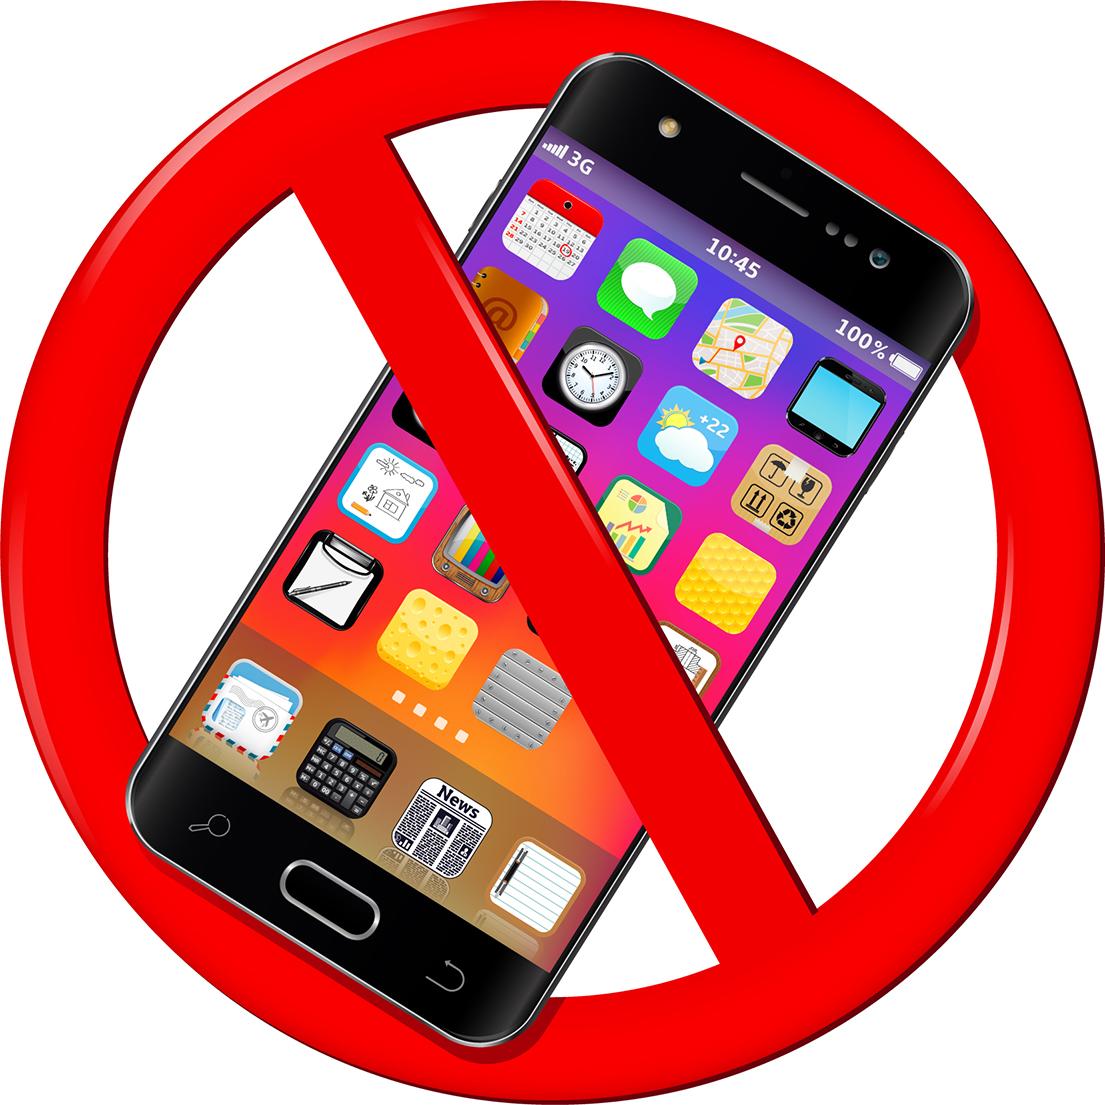 No phone bpri9k